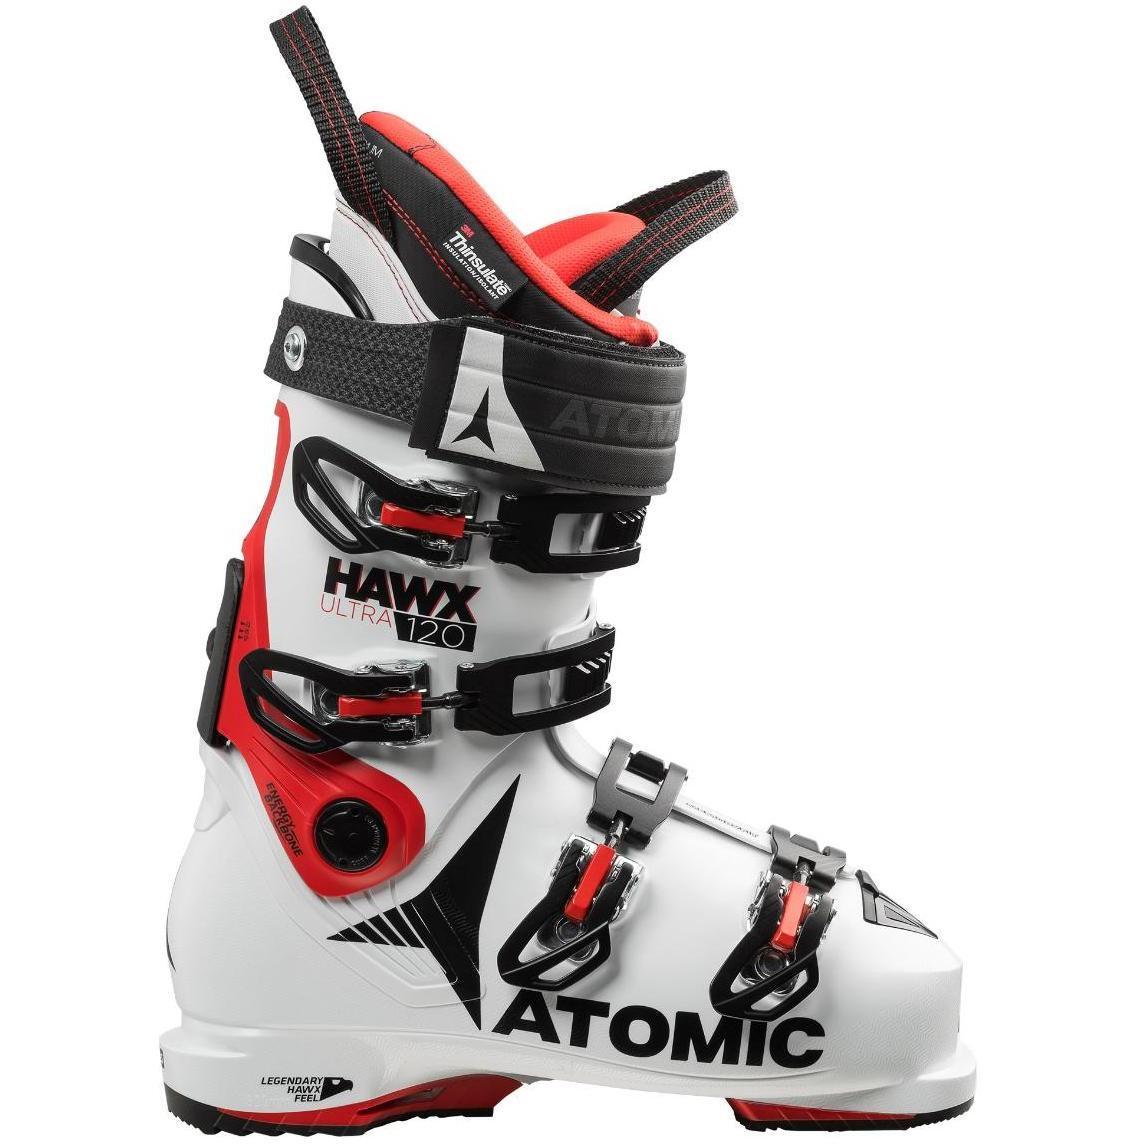 15779ade55e3 Горнолыжные ботинки Atomic 2017-18 HAWX ULTRA 120 White Red Bla ...